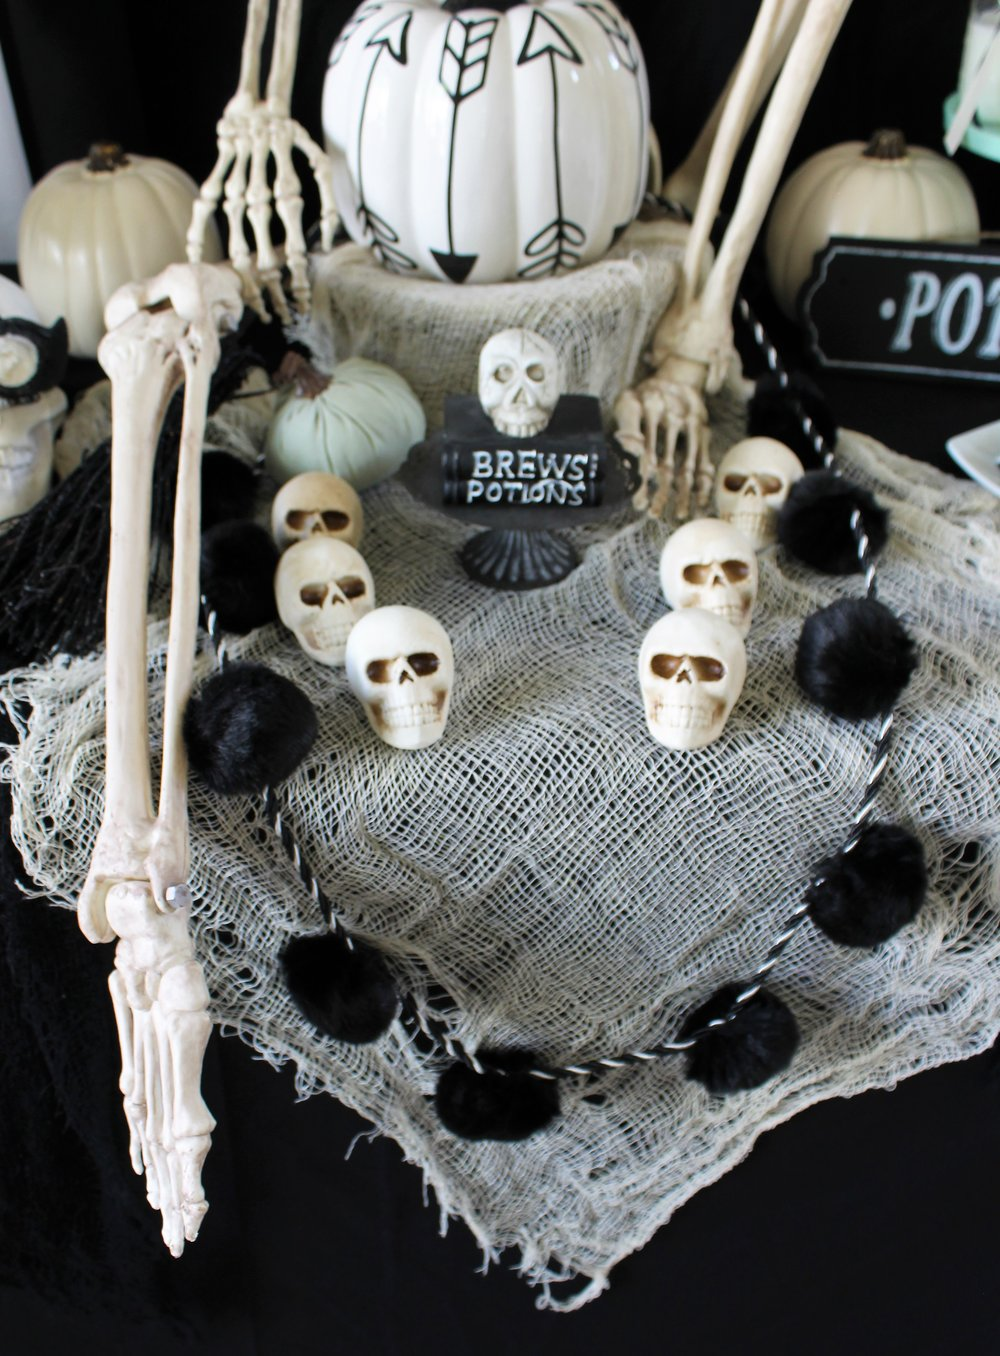 Halloween Party Ideas-Pastel Halloween -Mint Halloween-Halloween Dessert Table-Halloween Desserts-Halloween Candy Table-Boho Halloween-Halloween Skeleton-Halloween Party Ideas-Skulls-Halloween Skulls-www.SugarPartiesLA.com